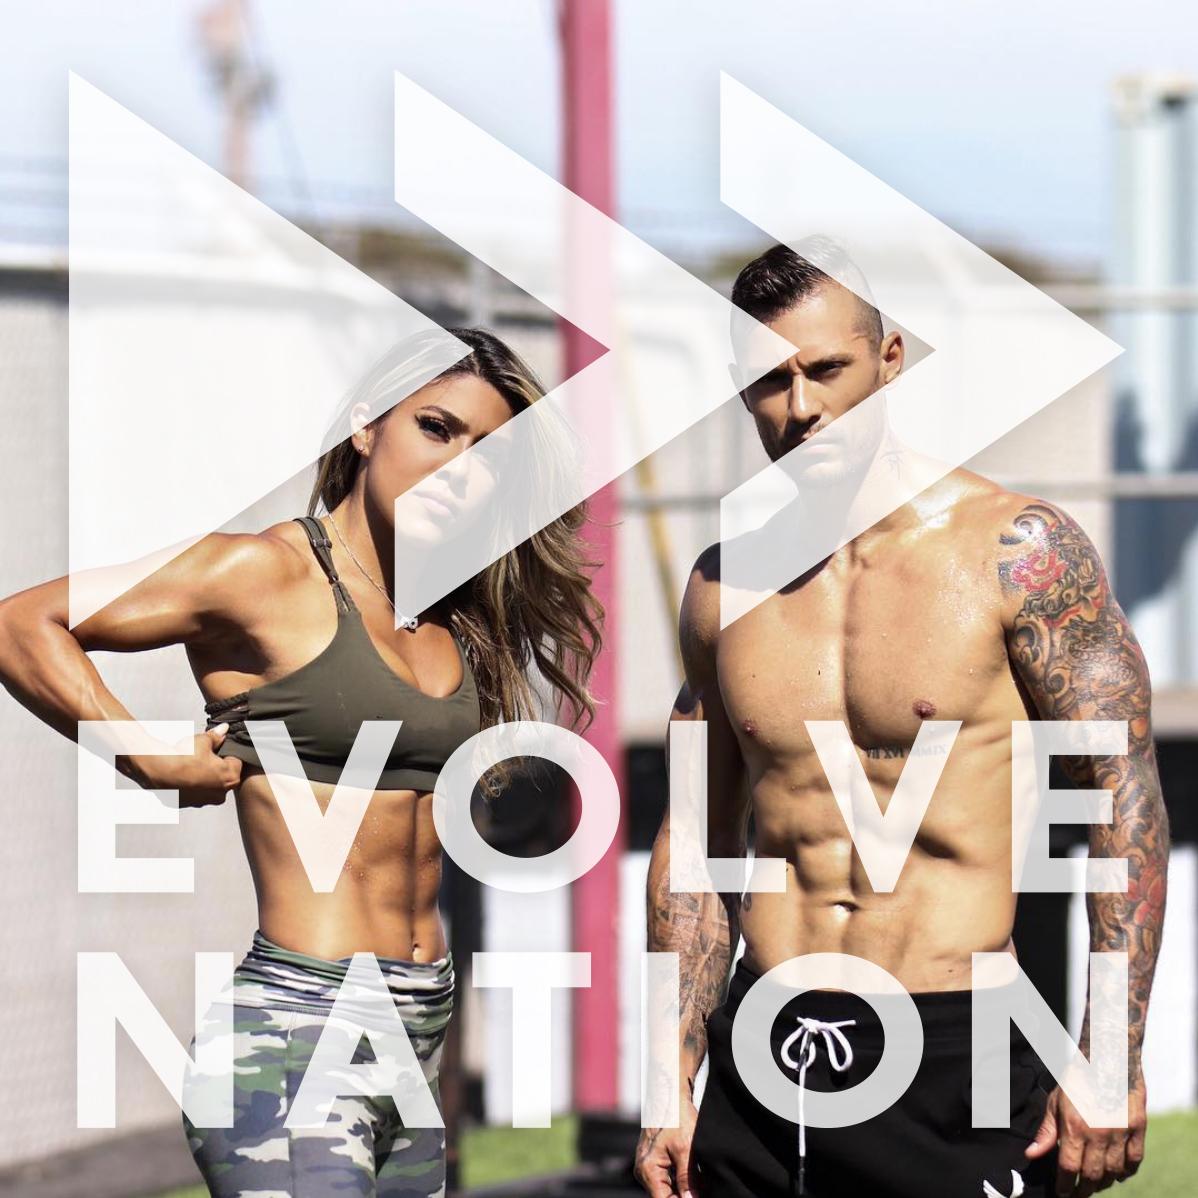 EvolveNation_Logo-Lifestyle_Heba-Man.jpg